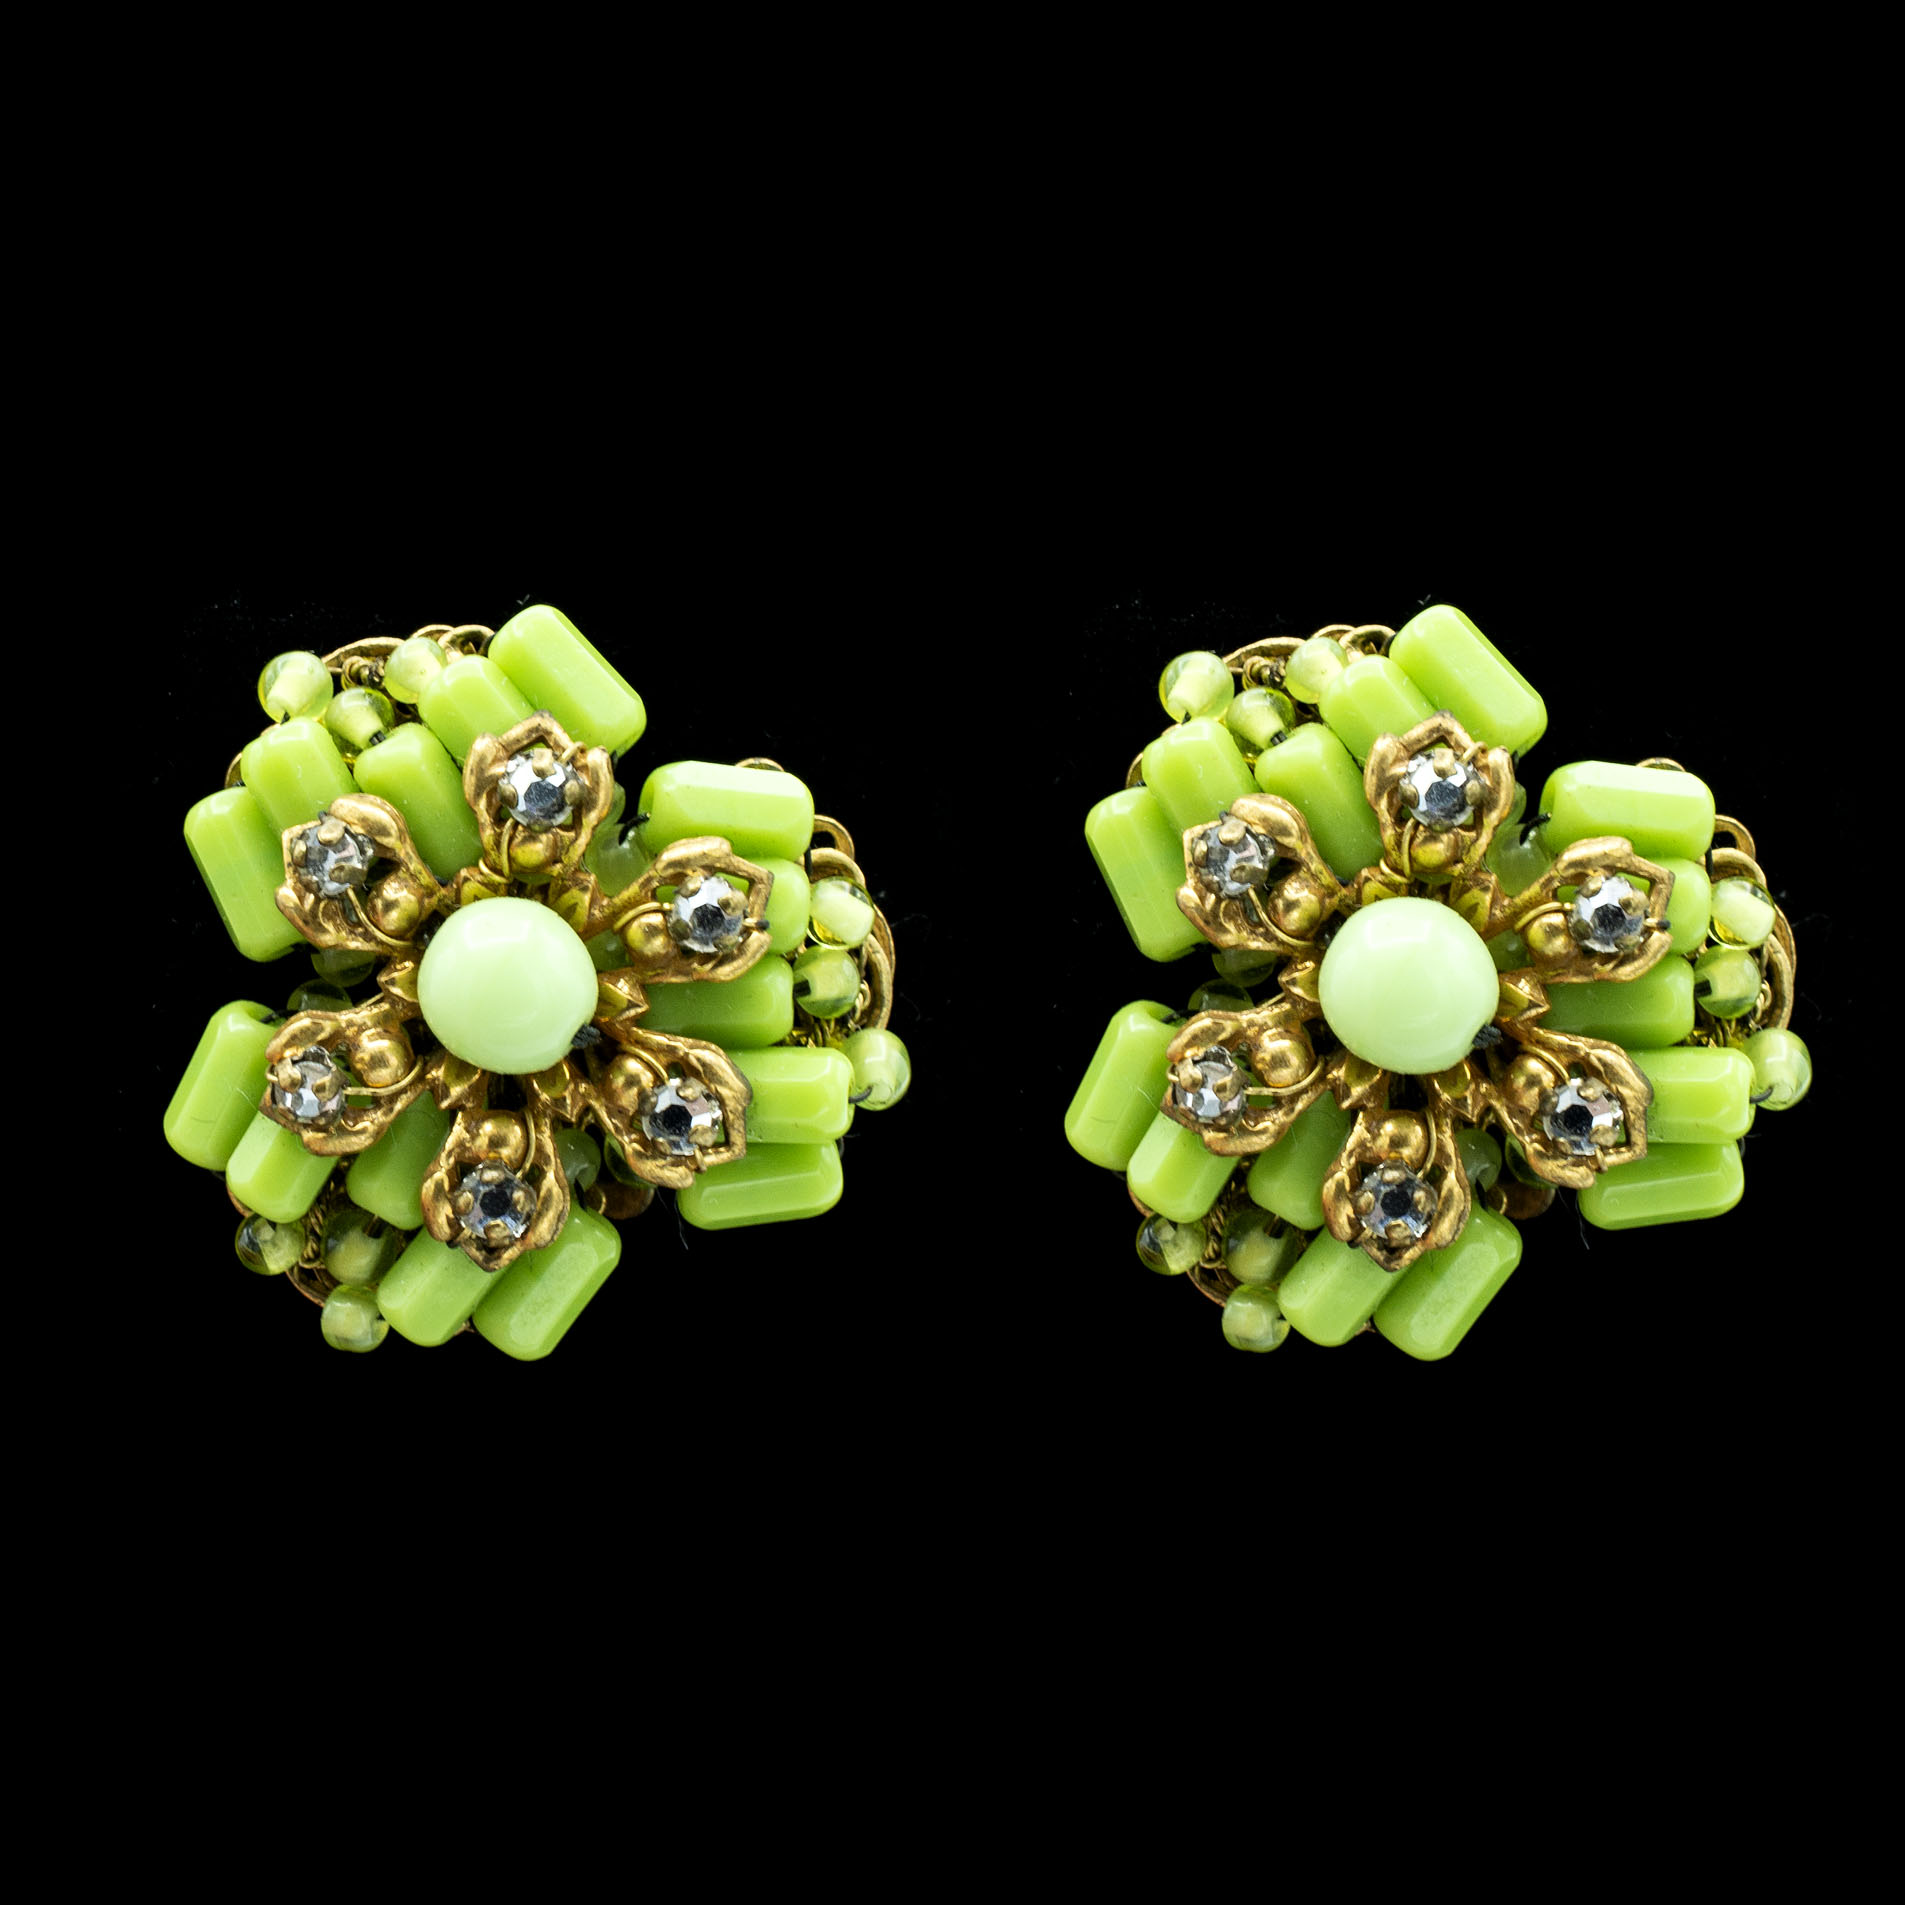 Baqijian Silver Color Love Heart Ring Stackable Ring Purple Zircon Women Wedding Jewelry Pa7210 Red 7